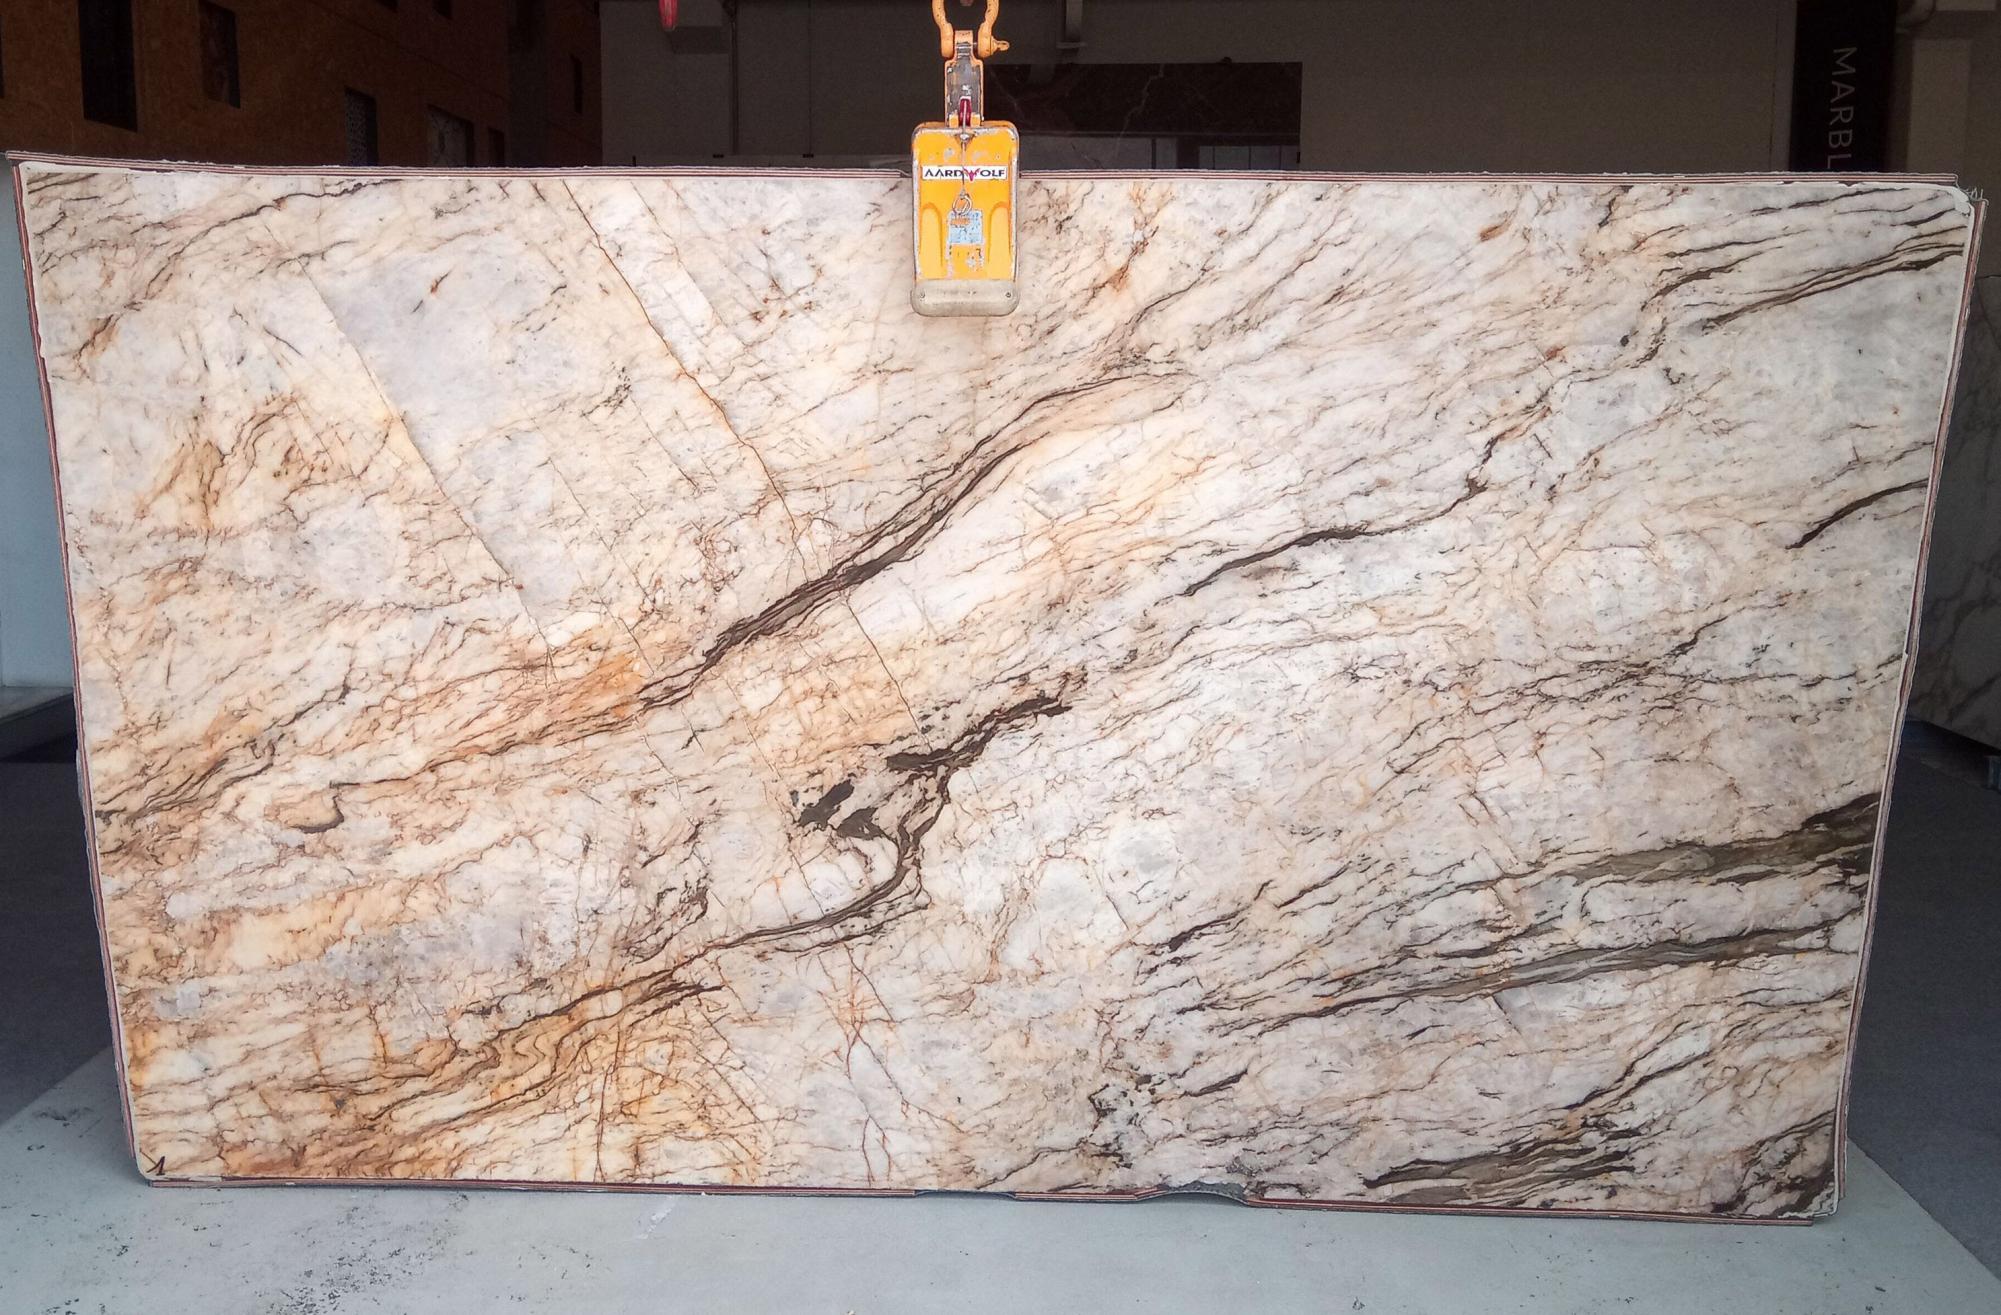 TEMPEST CRISTALLO Fourniture Veneto (Italie) d' dalles brillantes en quartzite naturel A0111 , SL2CM